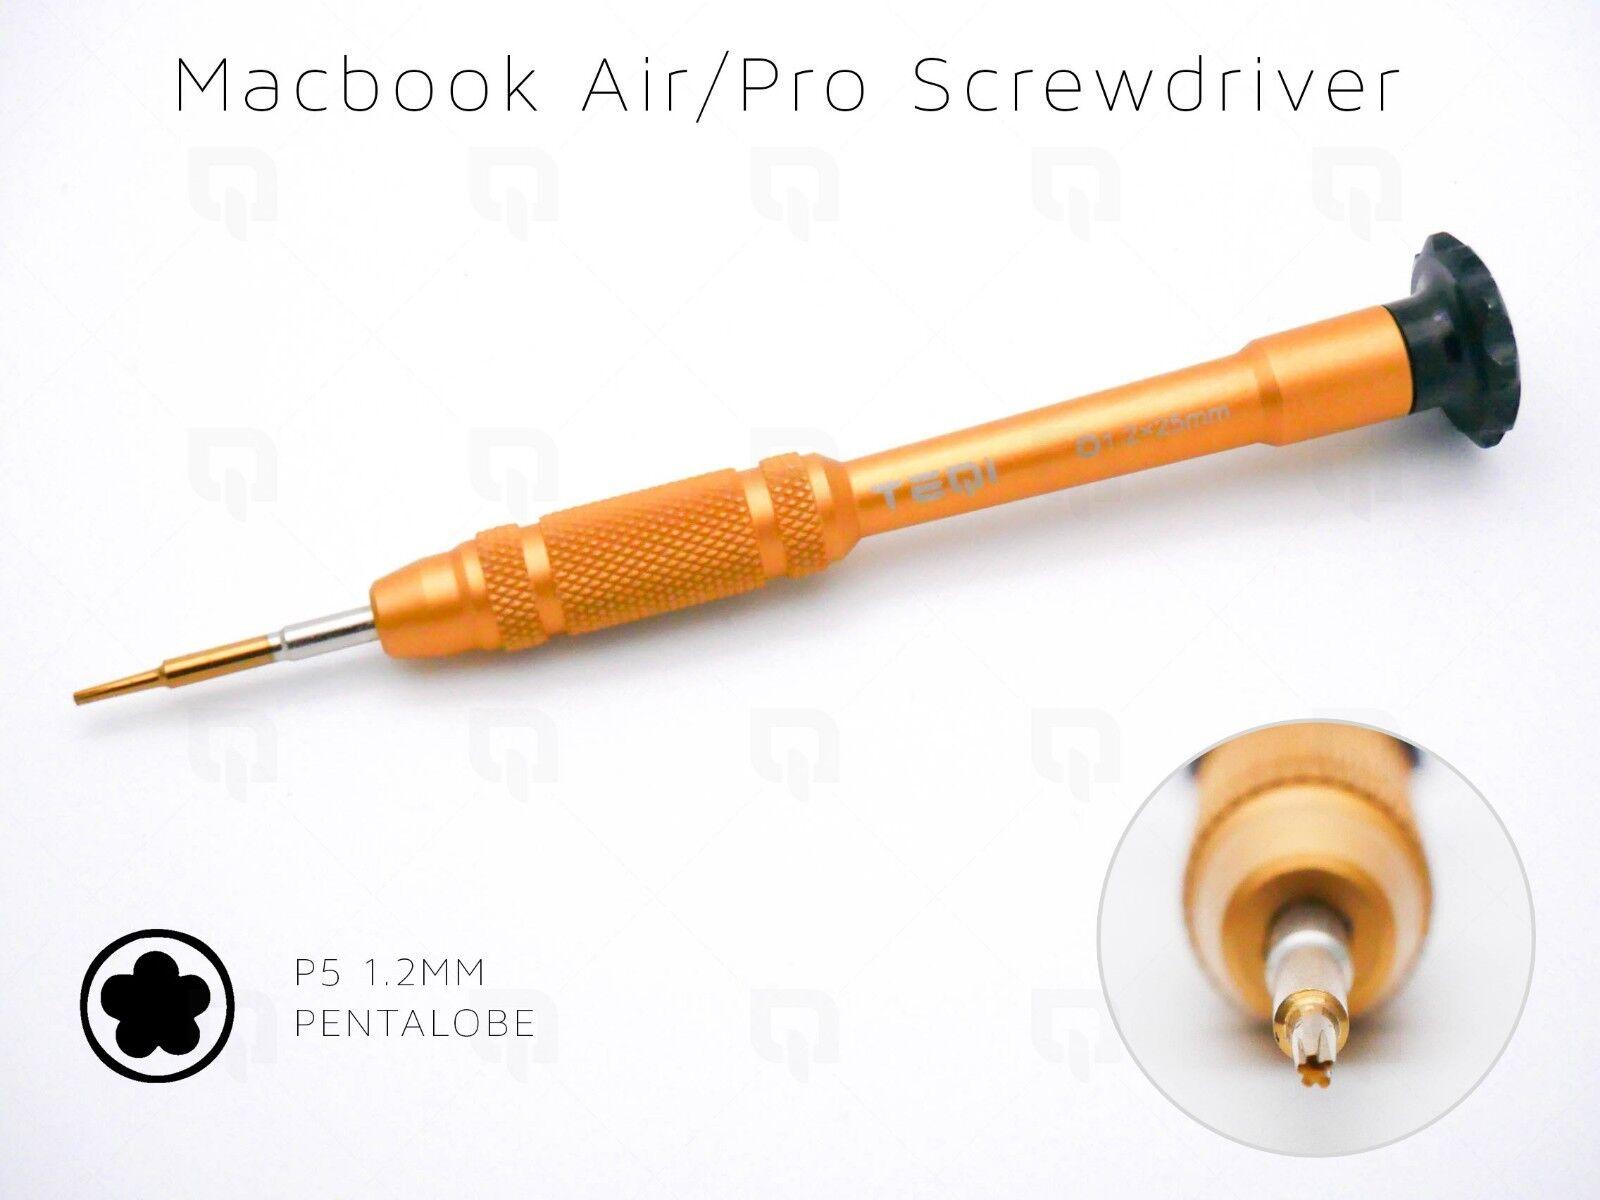 P5 1.2MM PENTALOBE SCREWDRIVER APPLE MACBOOK AIR /& MACBOOK RETINA CASE TOOL